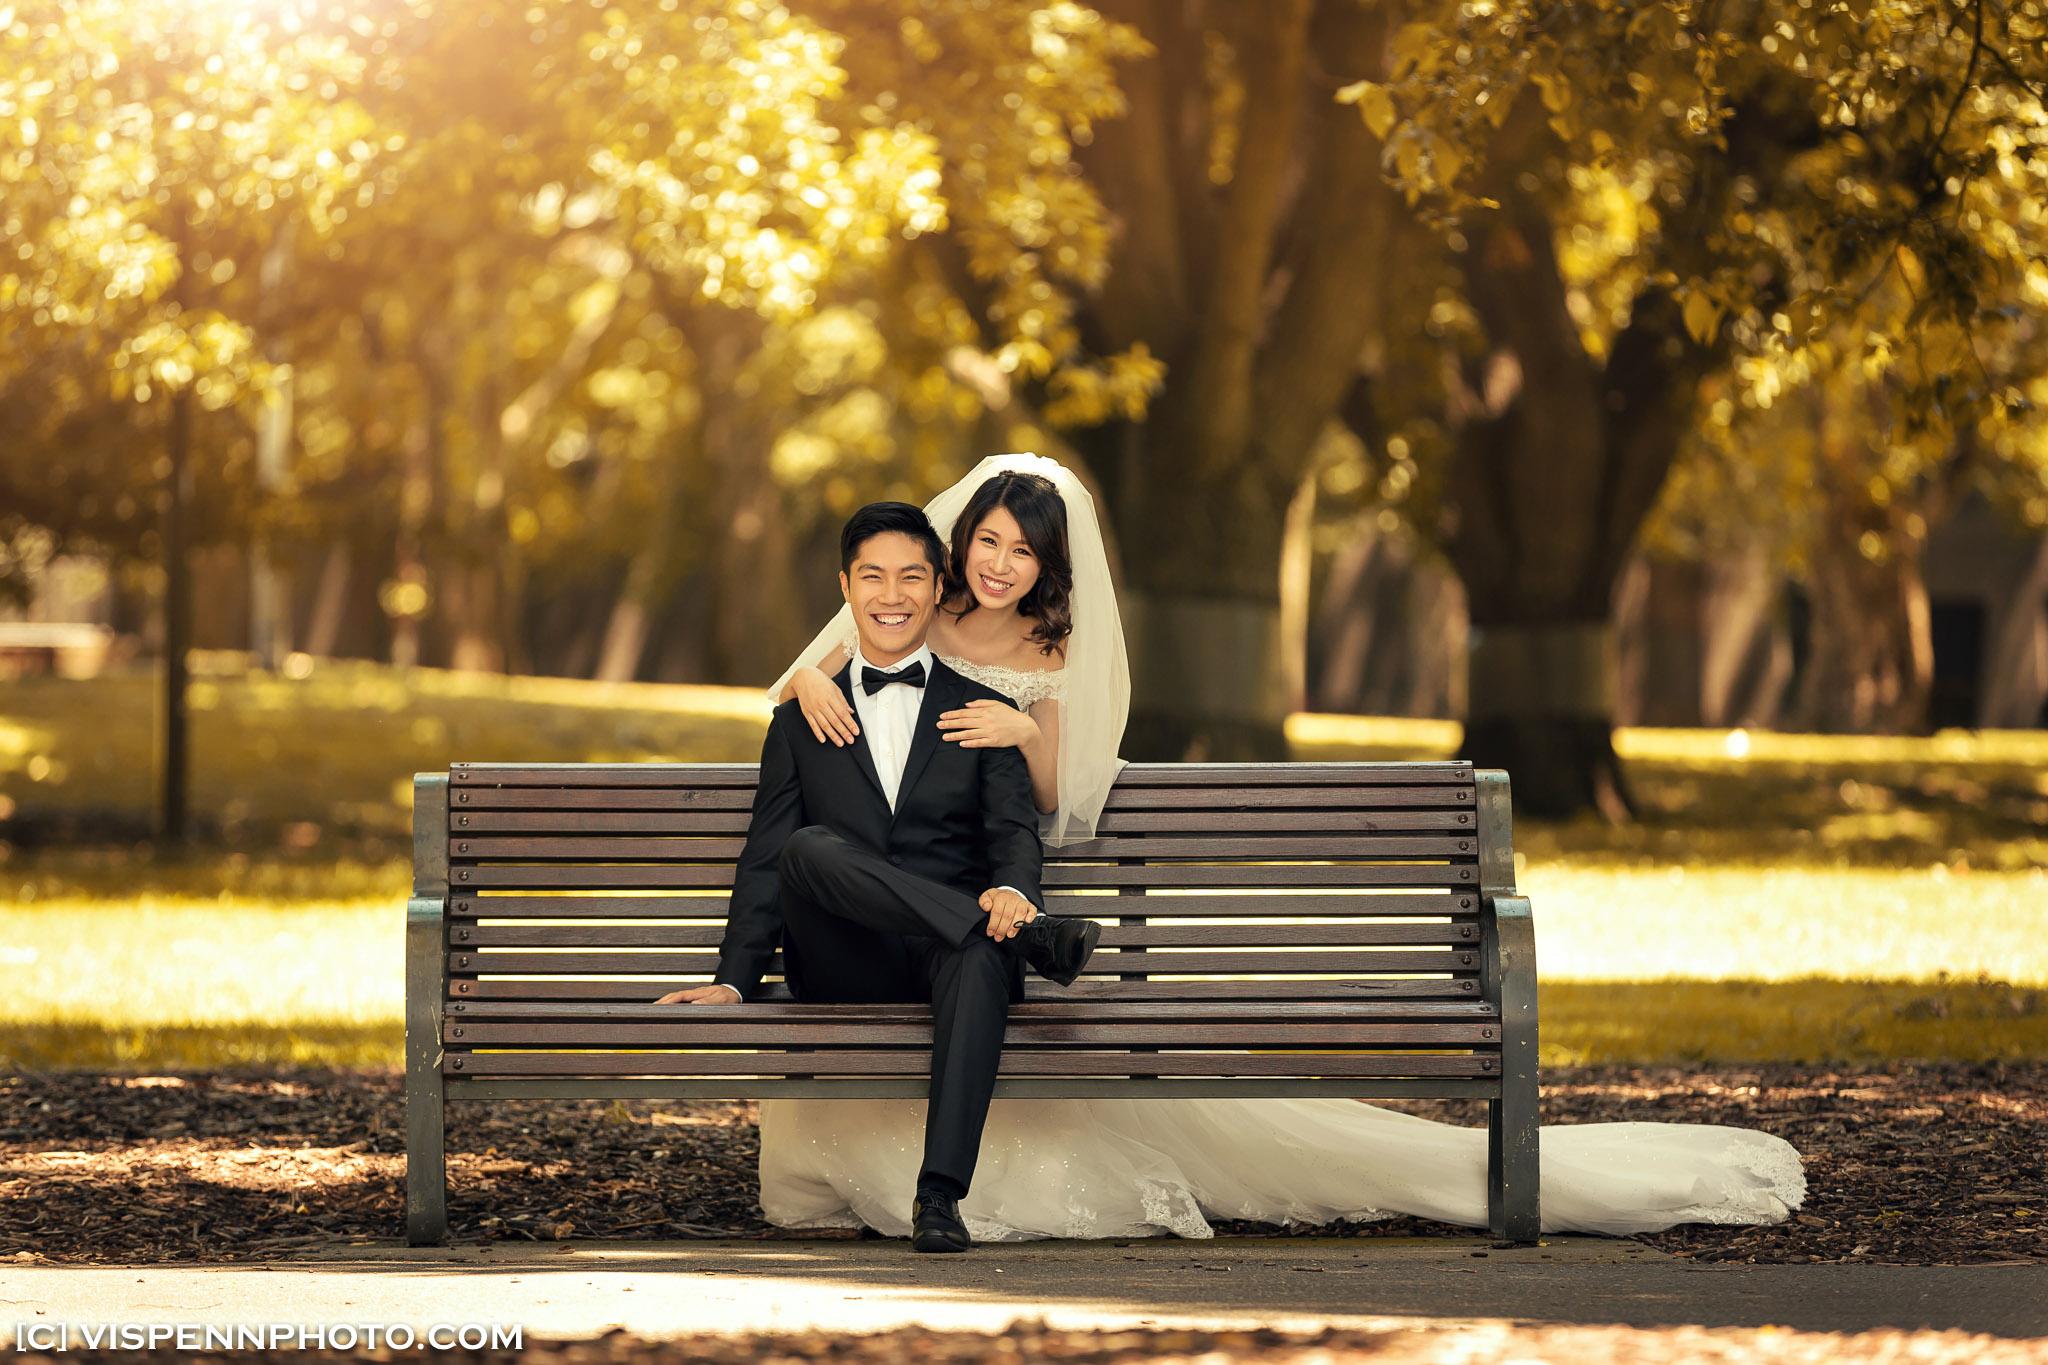 PRE WEDDING Photography Melbourne VISPENN 墨尔本 婚纱照 结婚照 婚纱摄影 VISPENN Cindi 0193